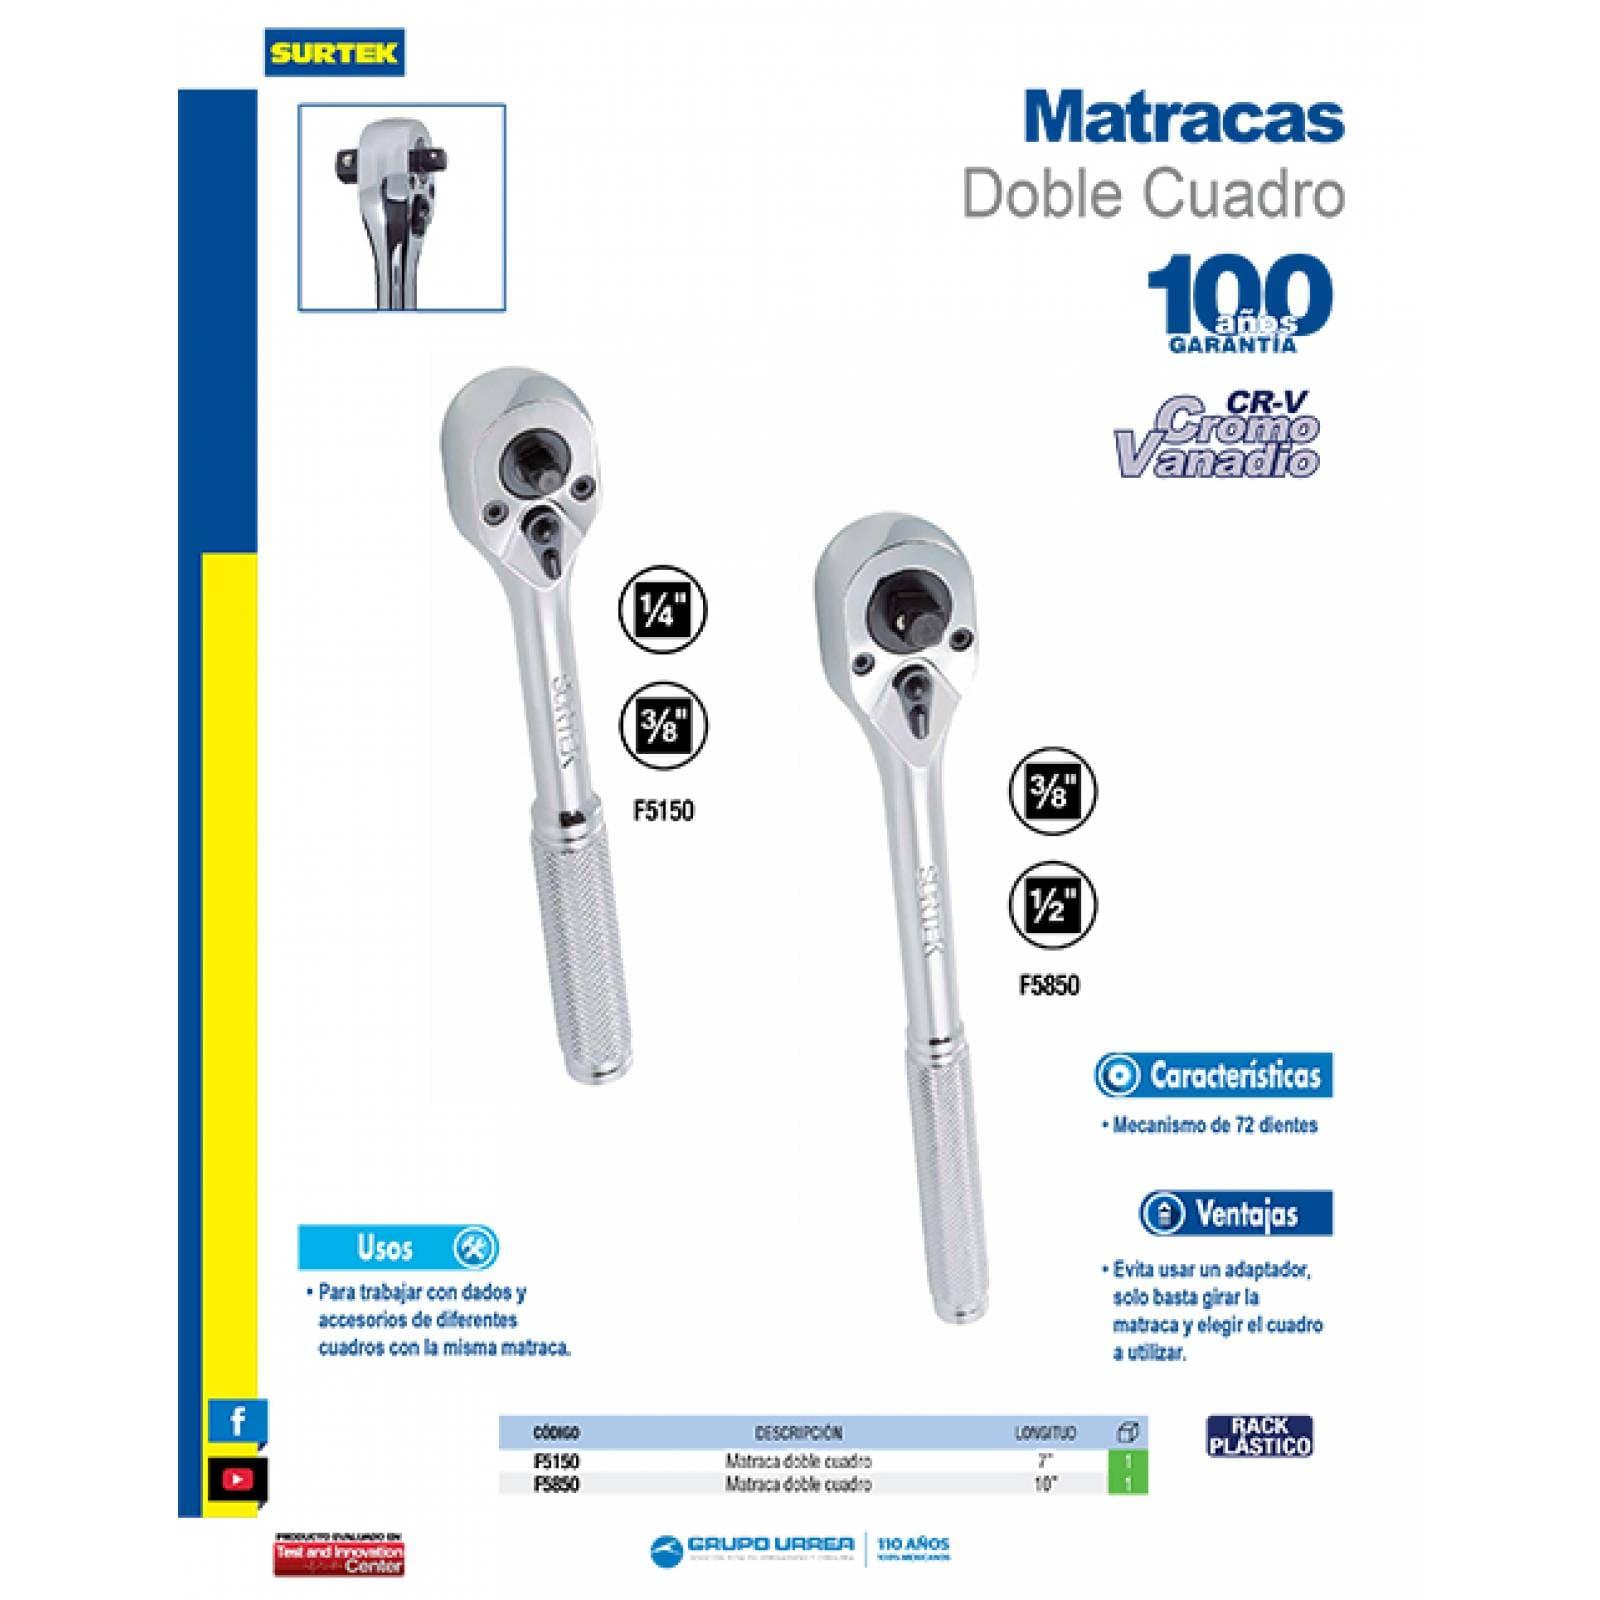 "Matraca Doble Cuadro 1/4""-3/8"" Longitud 7"" F5150 Surtek"